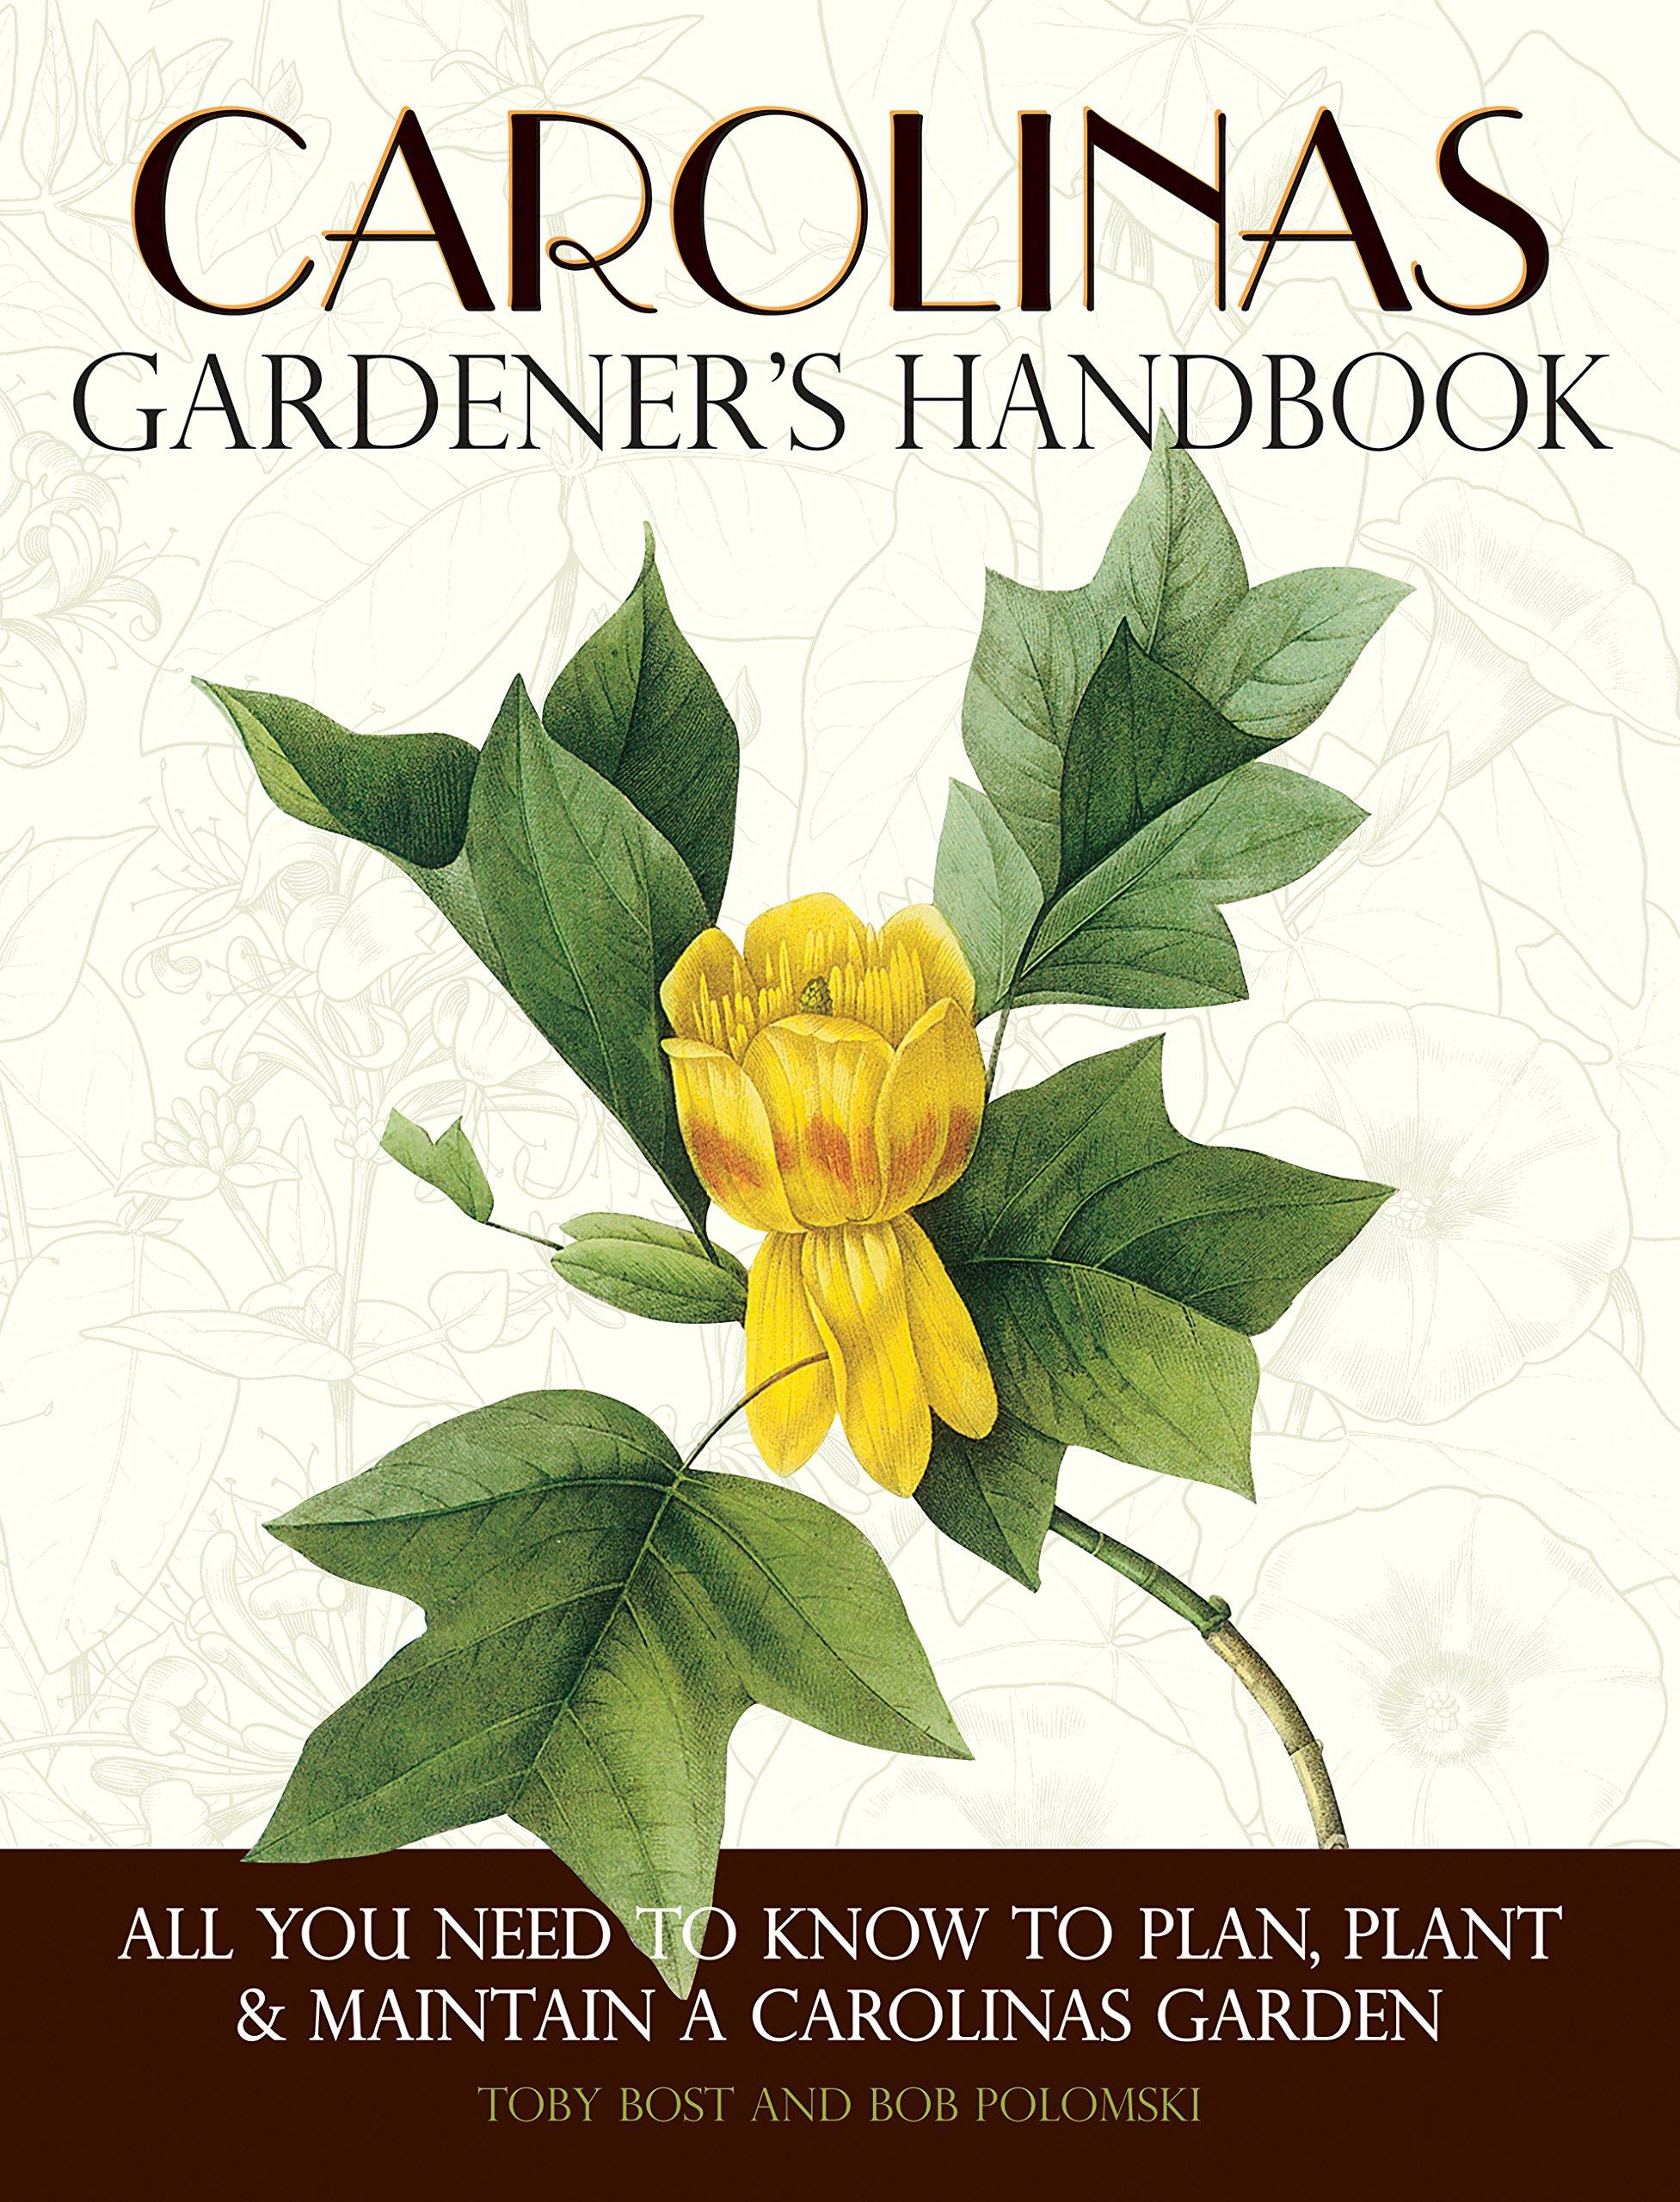 Carolinas Gardener's Handbook: All You Need to Know to Plan, Plant & Maintain a Carolinas Garden by Cool Springs Press